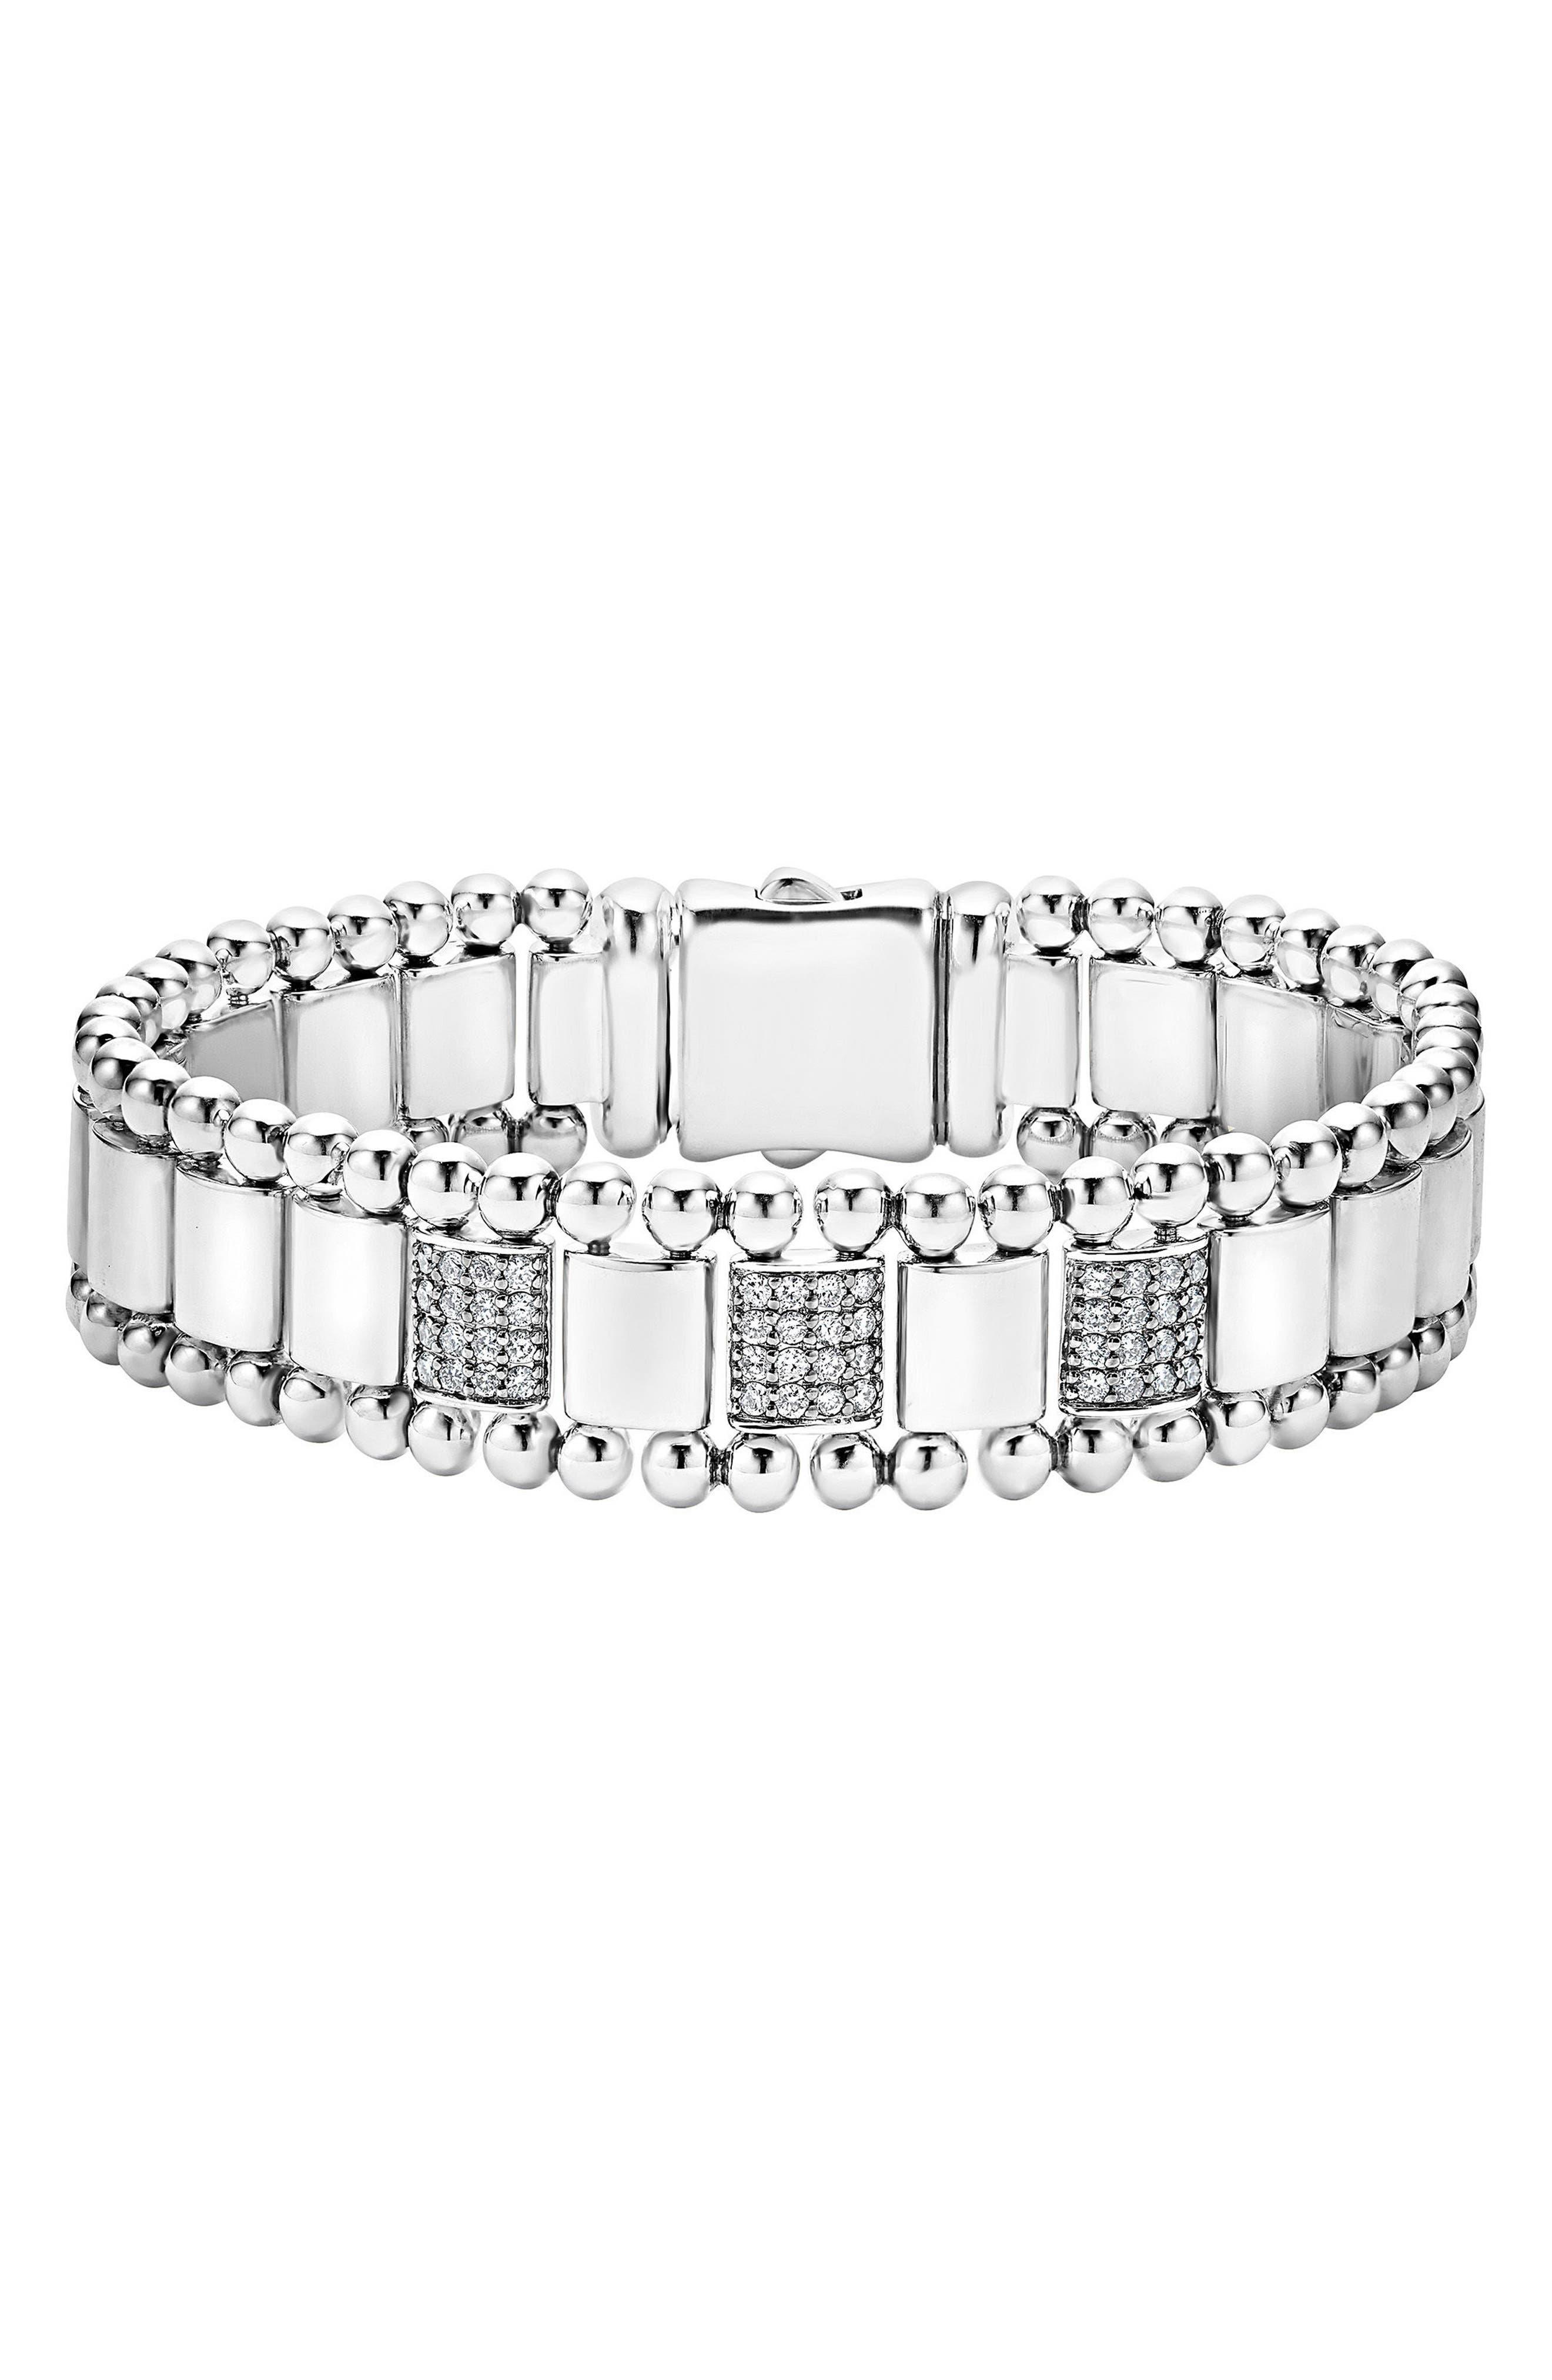 Caviar Spark Diamond Bracelet,                         Main,                         color, SILVER